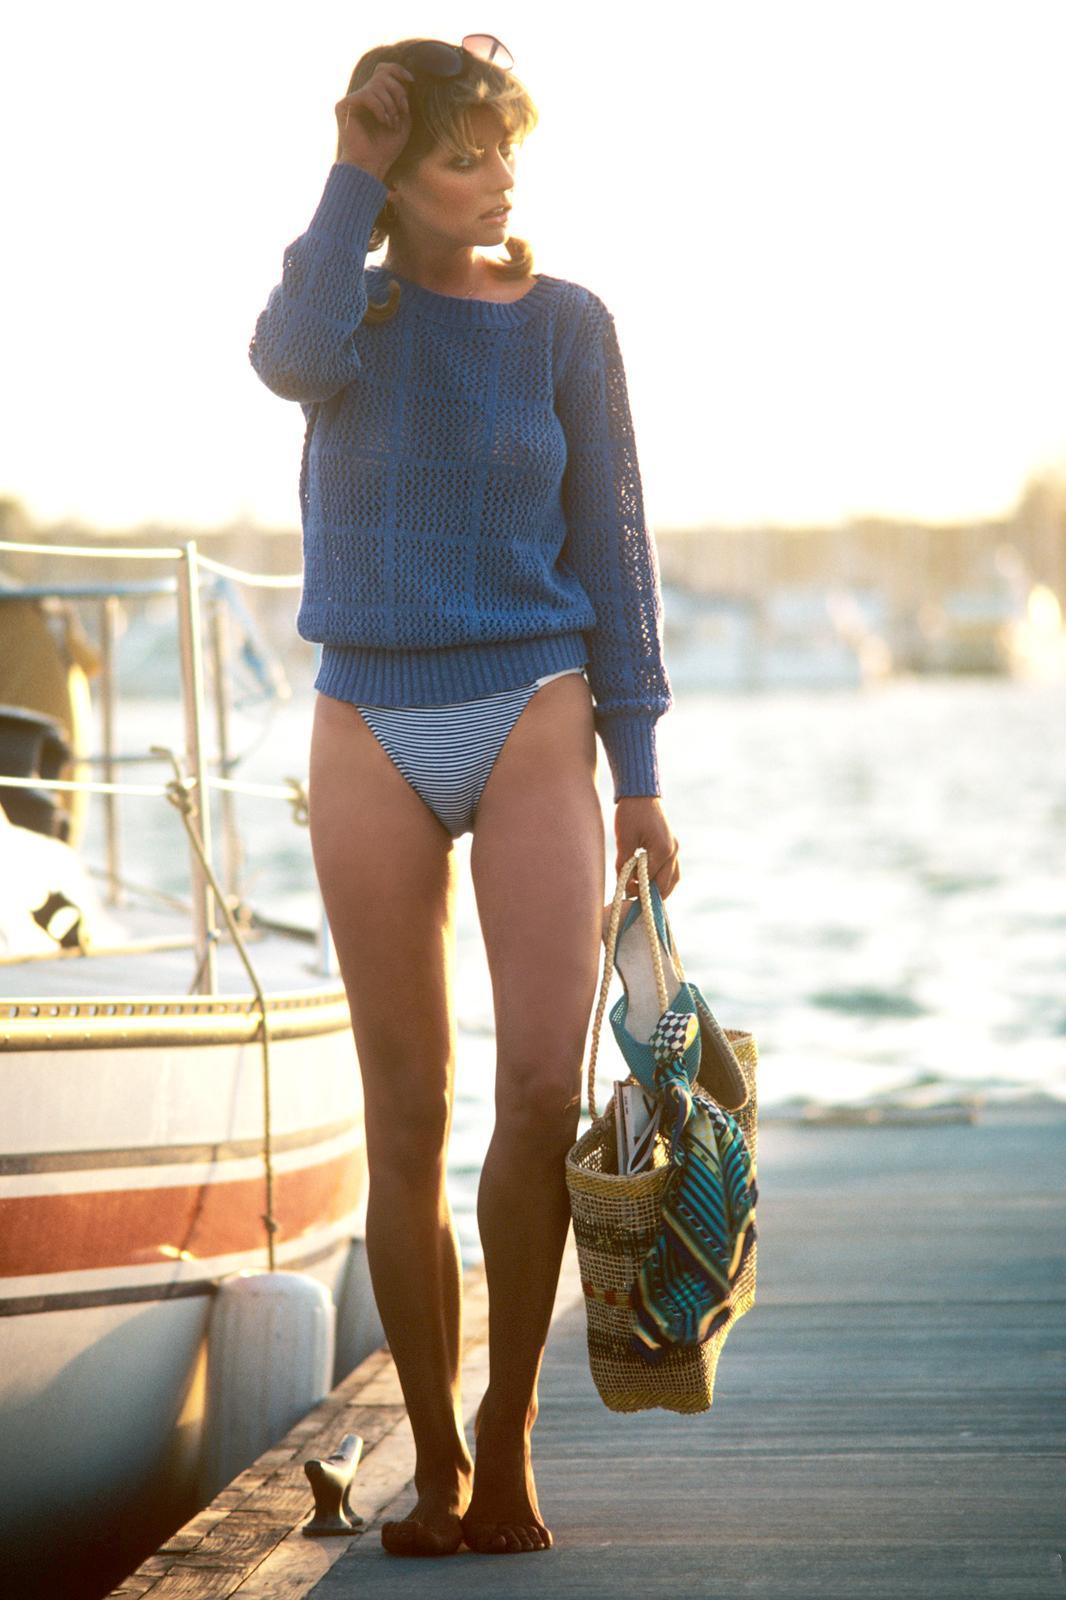 Hayley orrantia sexy pics